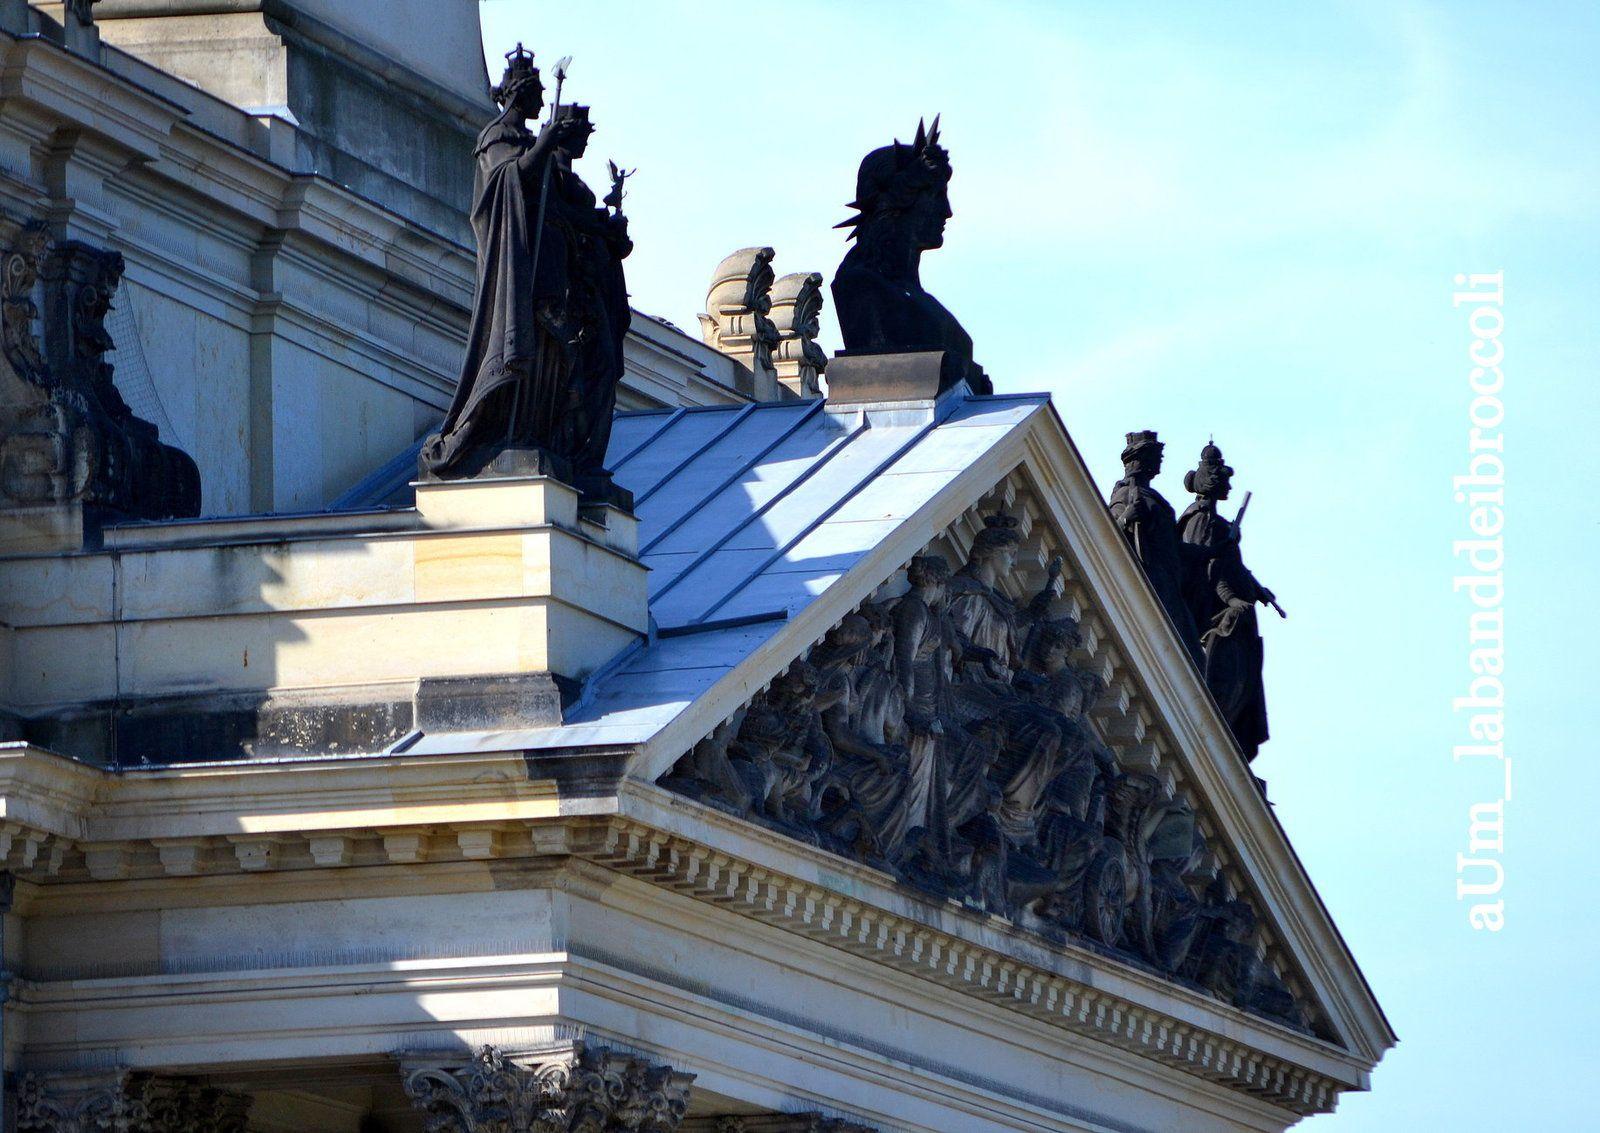 Dresda, una cittá magica